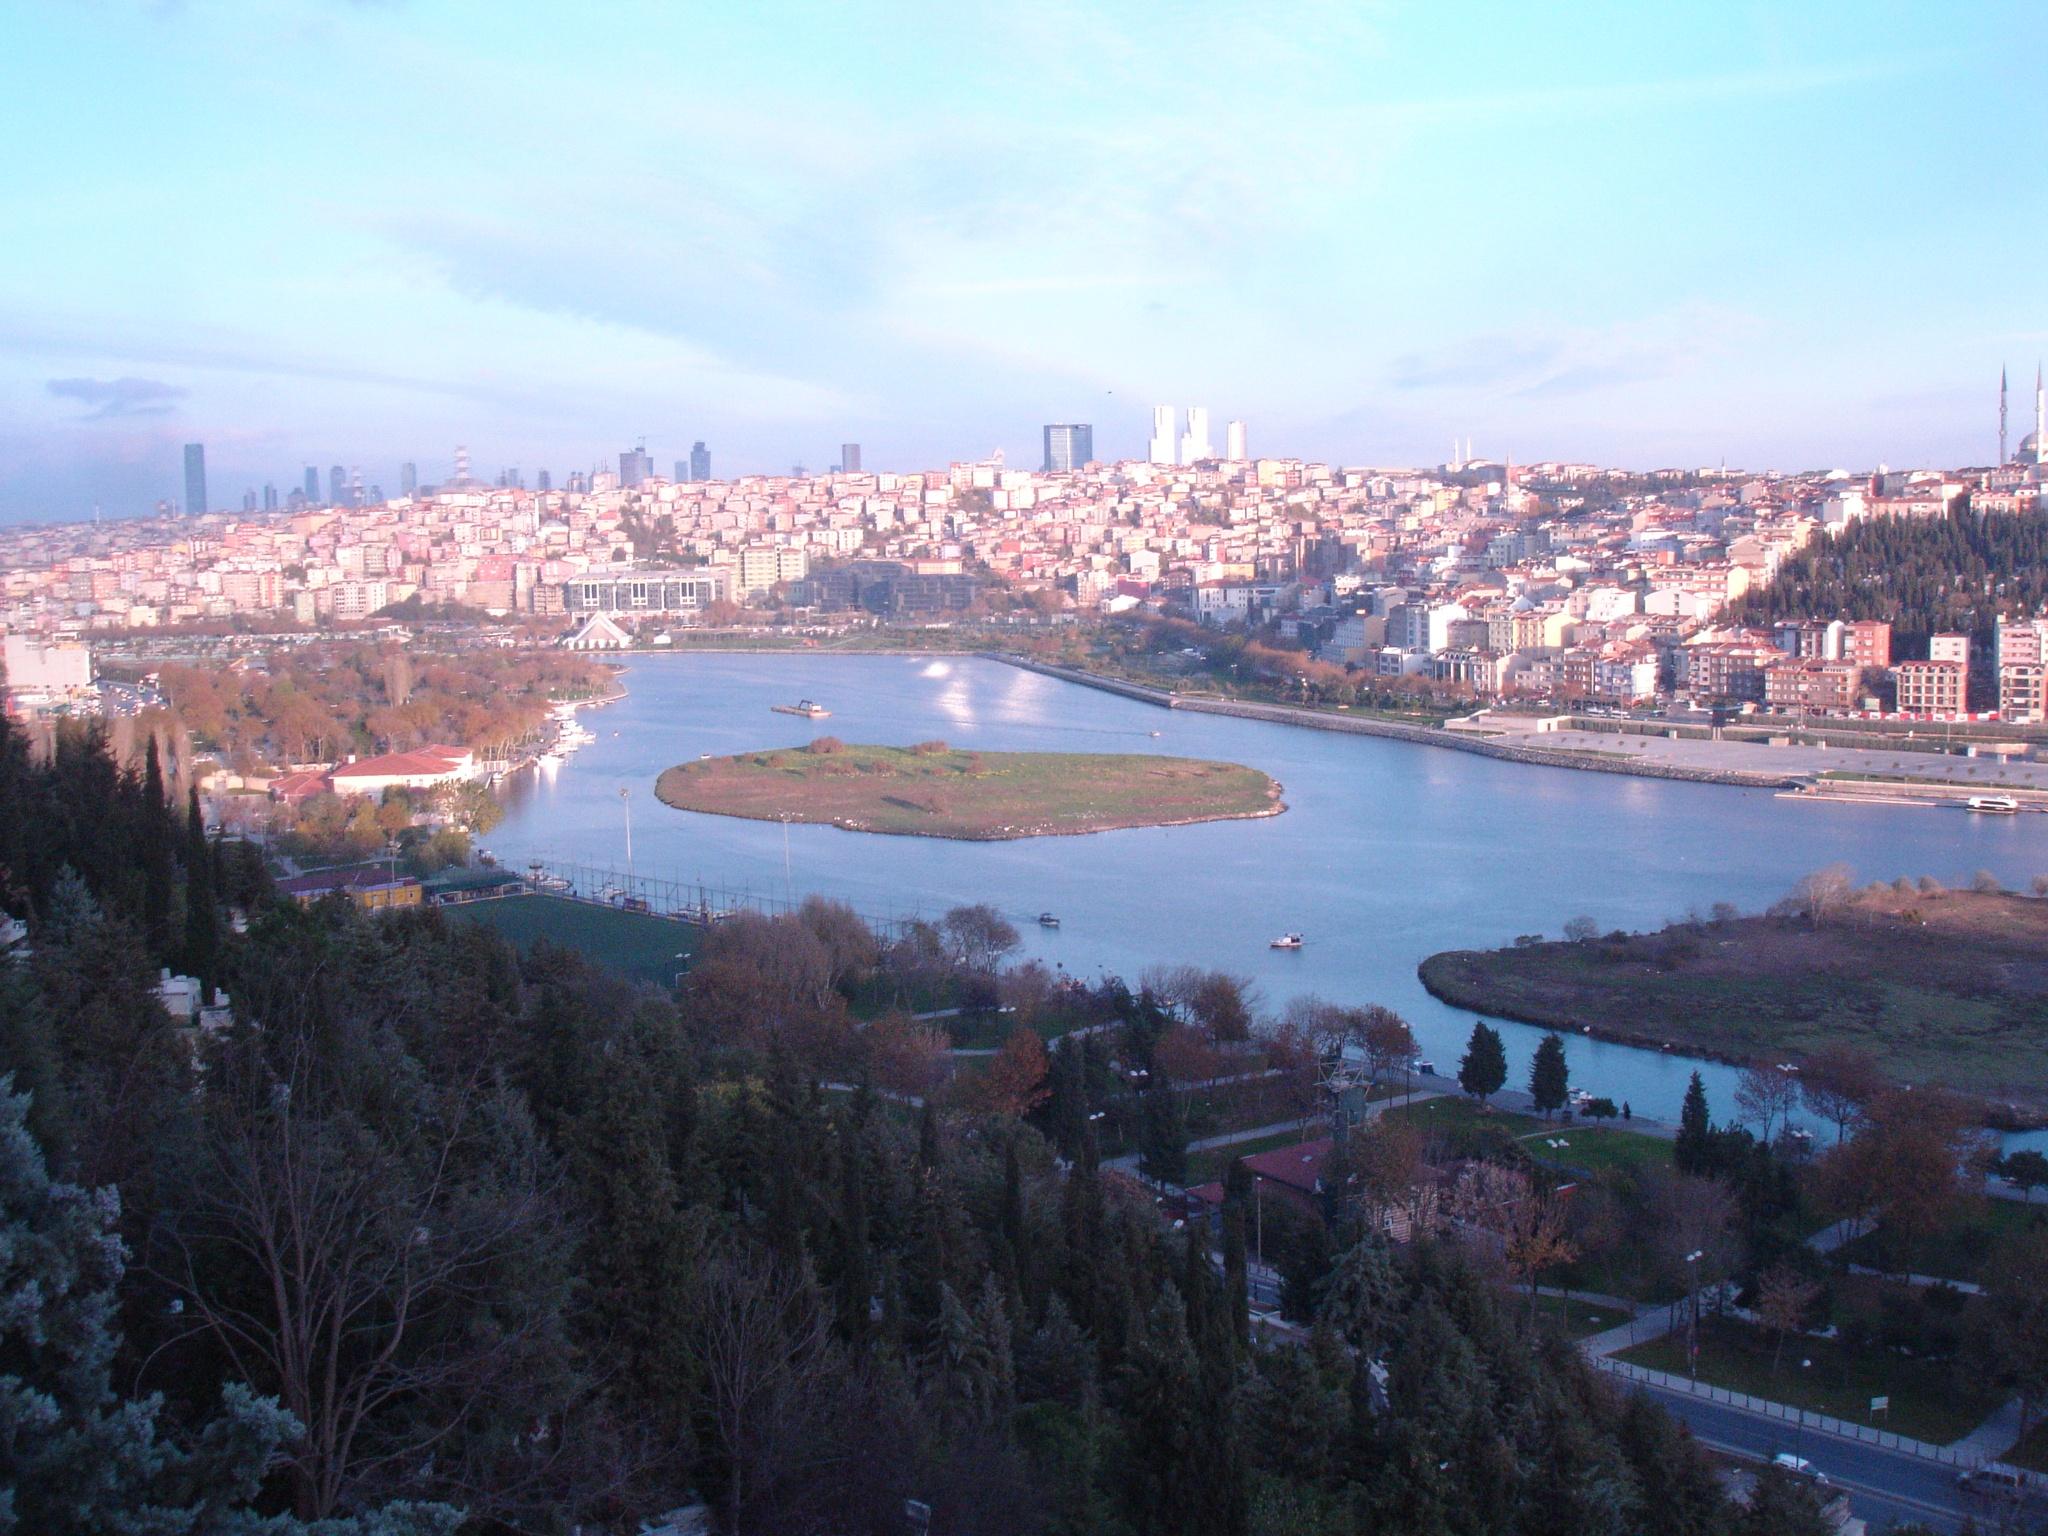 gold horn by Saygın Saner